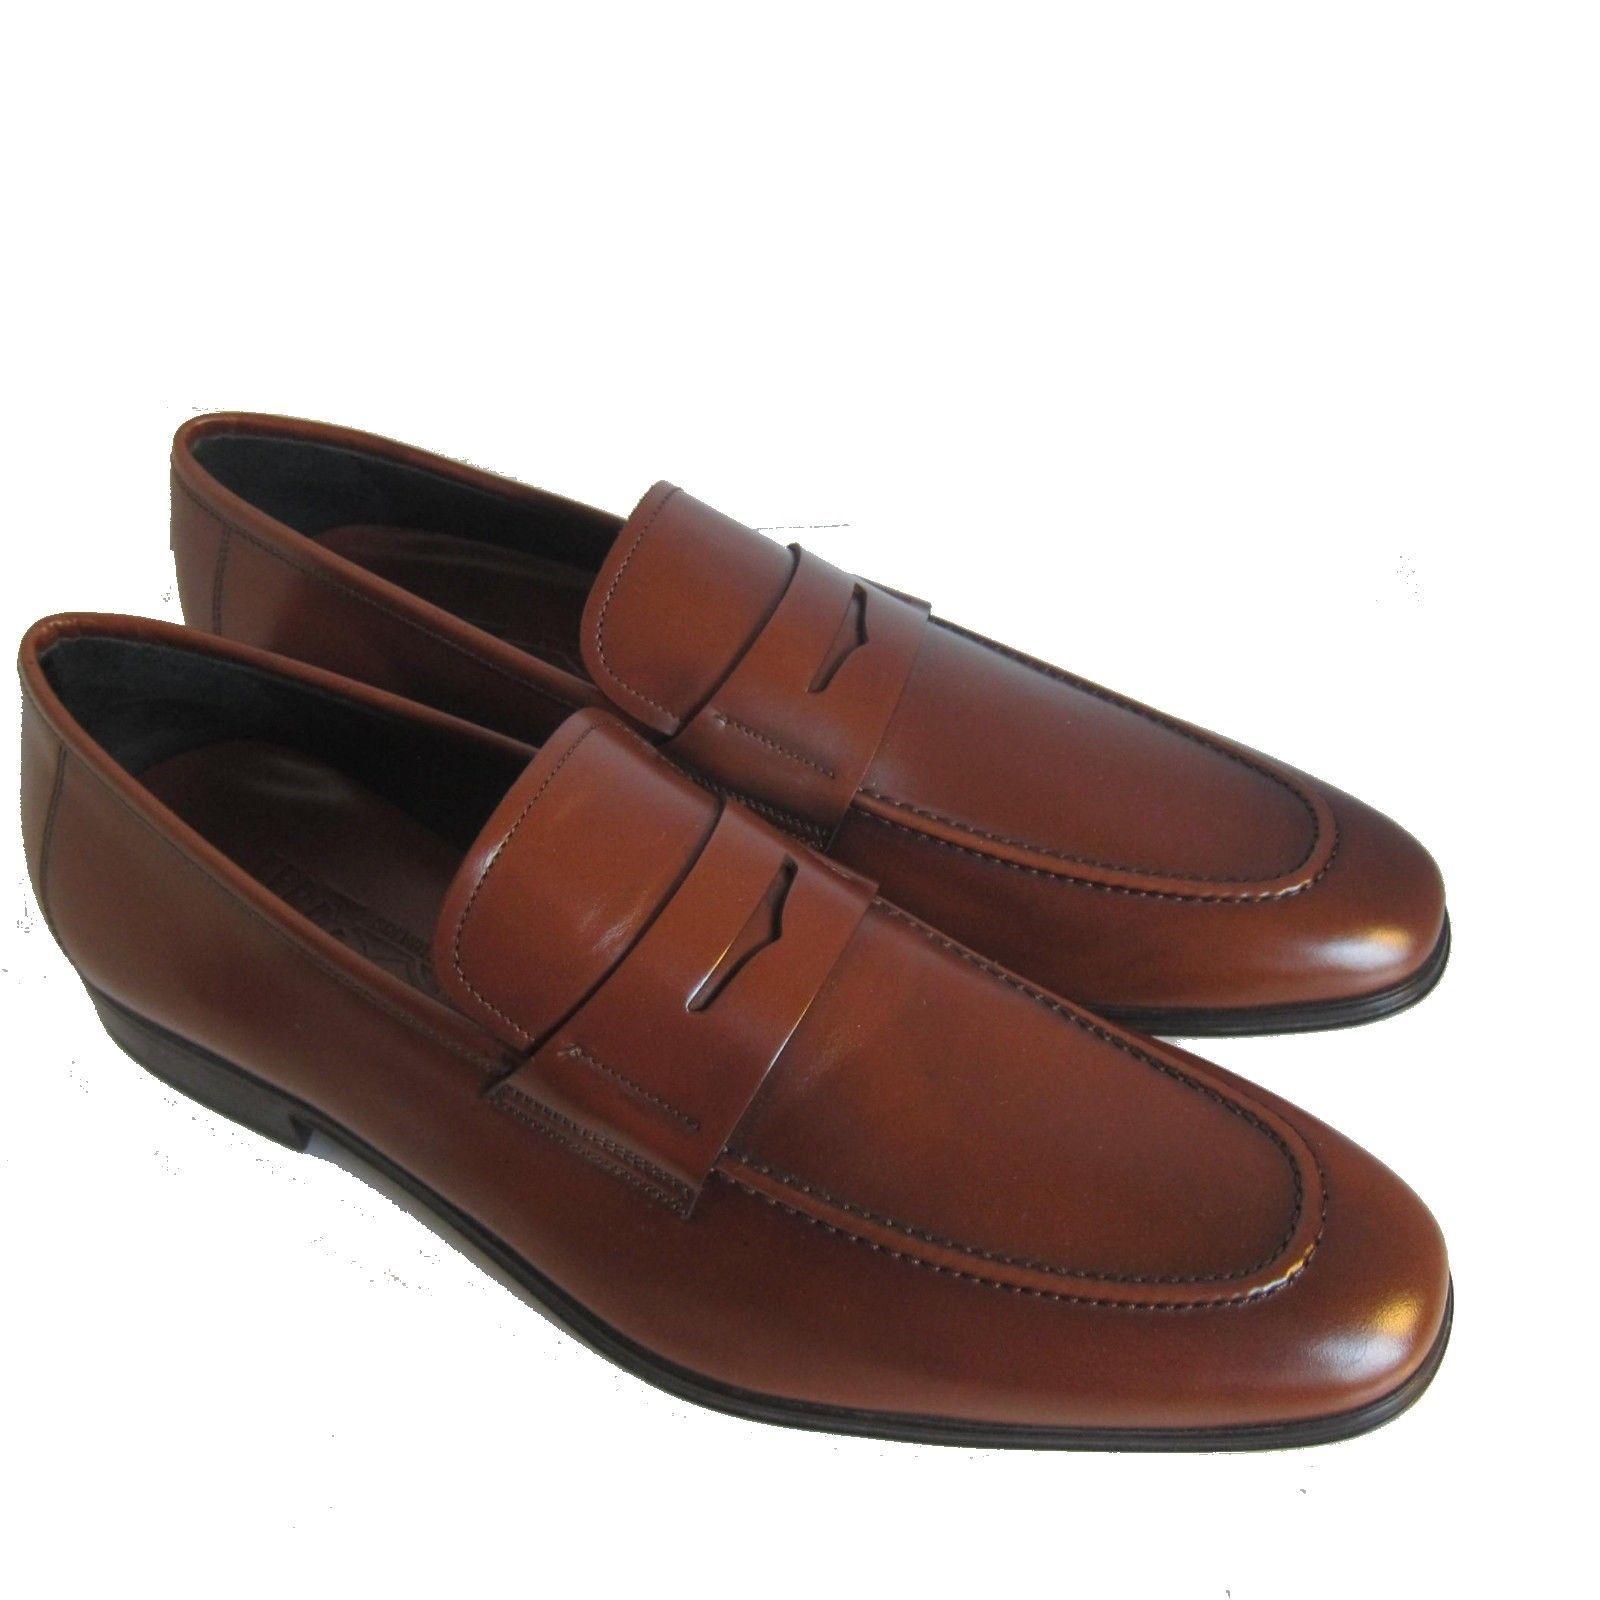 0353d2625bd L-3970156 New Salvatore Ferragamo Derry Brown Leather Loafers Shoes Size US  11 D -  351.49